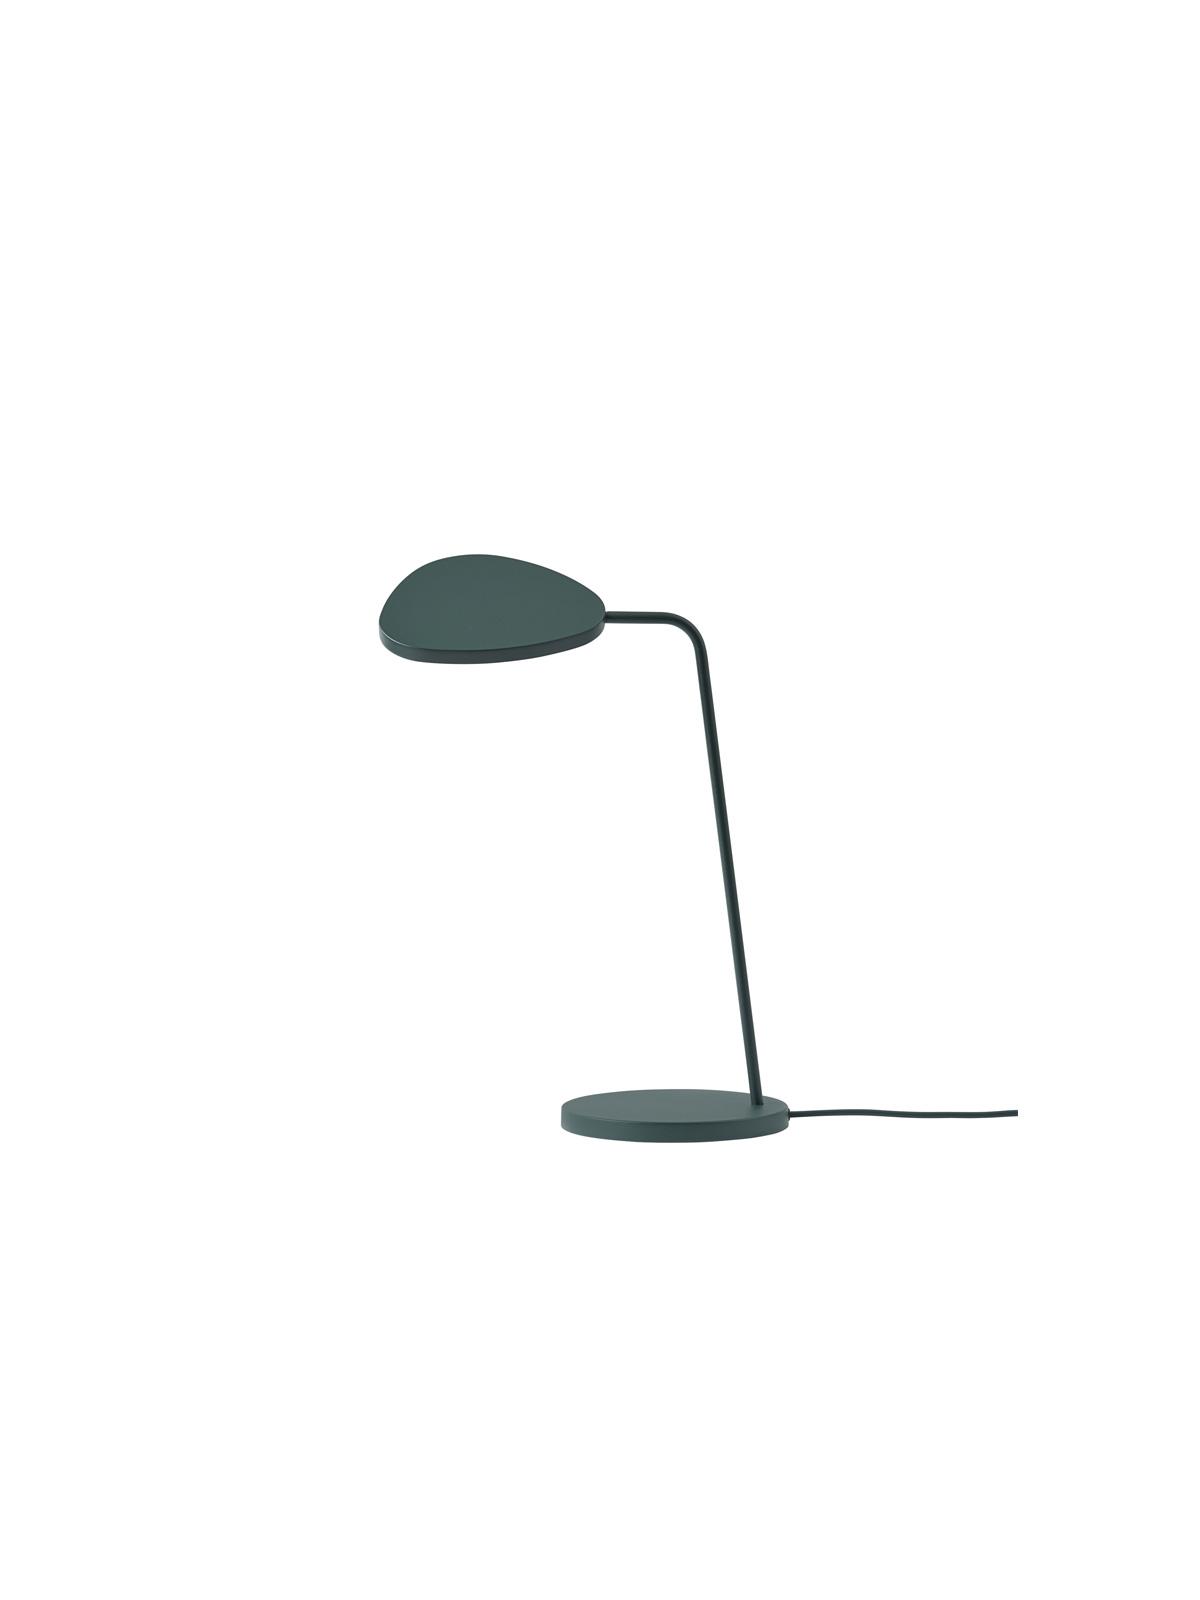 Leaf Table Tischleuchte LED Leselicht Muuto Dunkelgrün